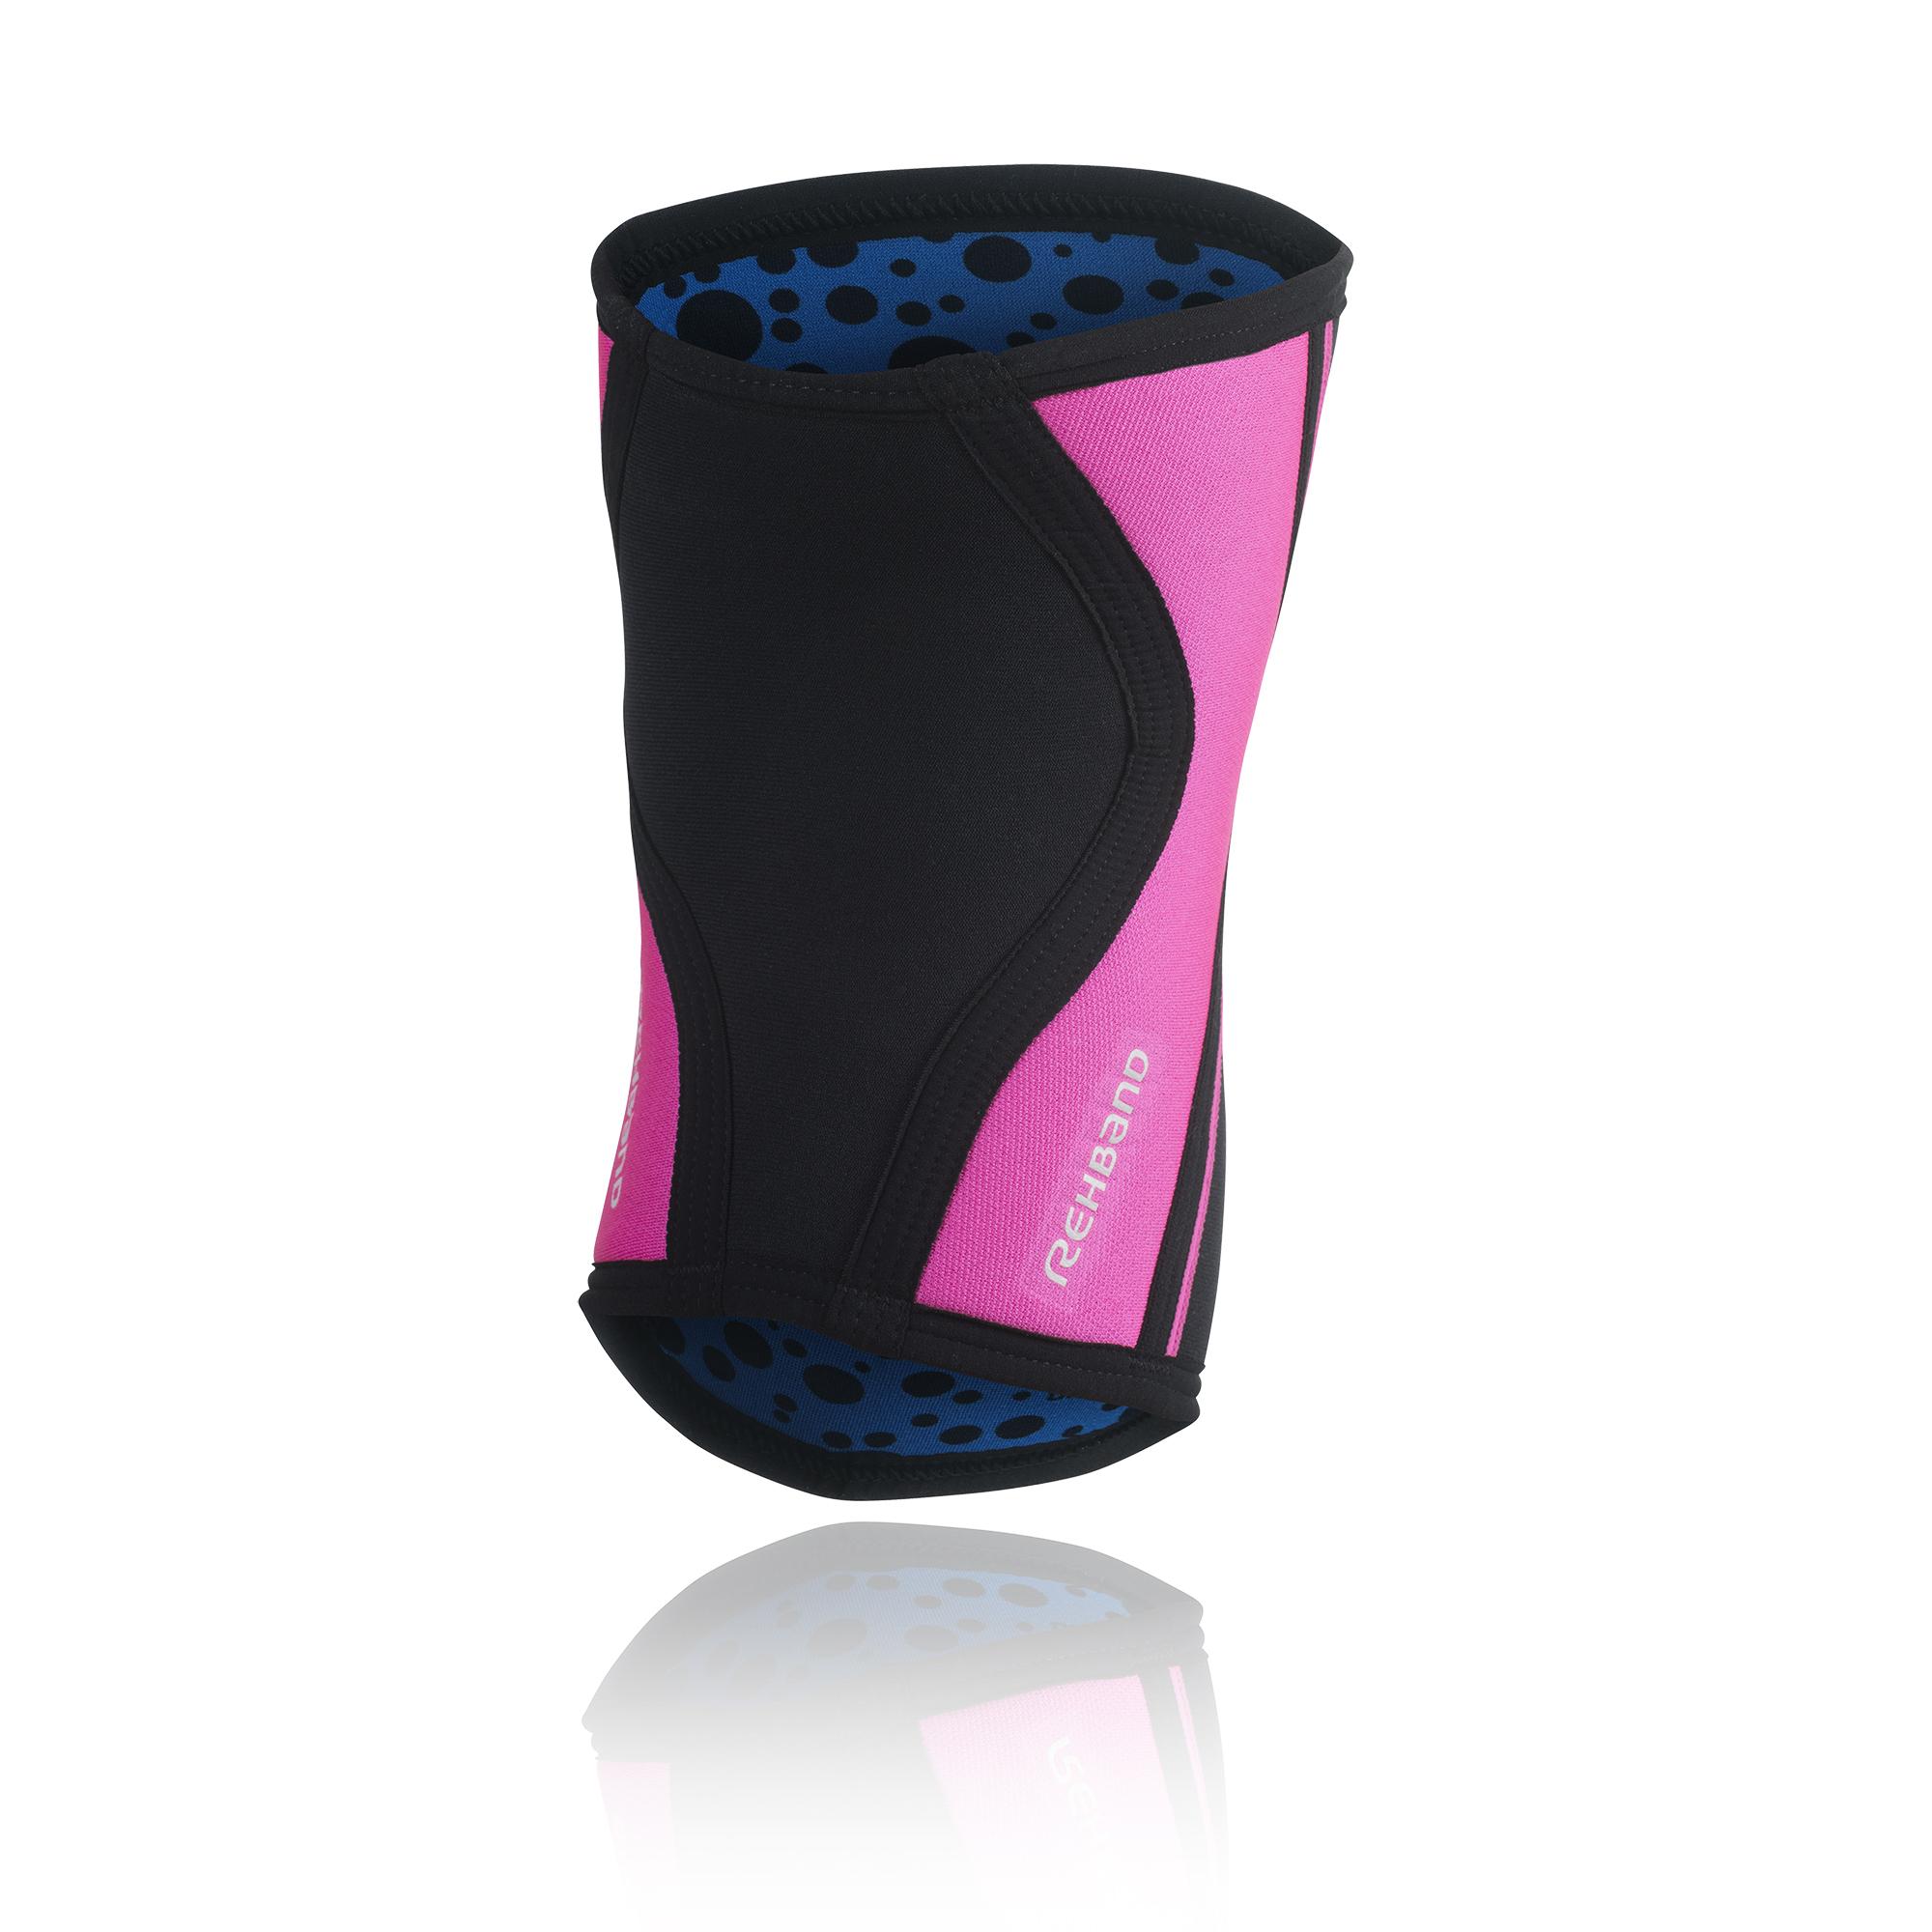 fe84f1d4f9 Rehband 105333 RX Knee Sleeve – Black/Pink, 5mm Neoprene – Jackal's Gym